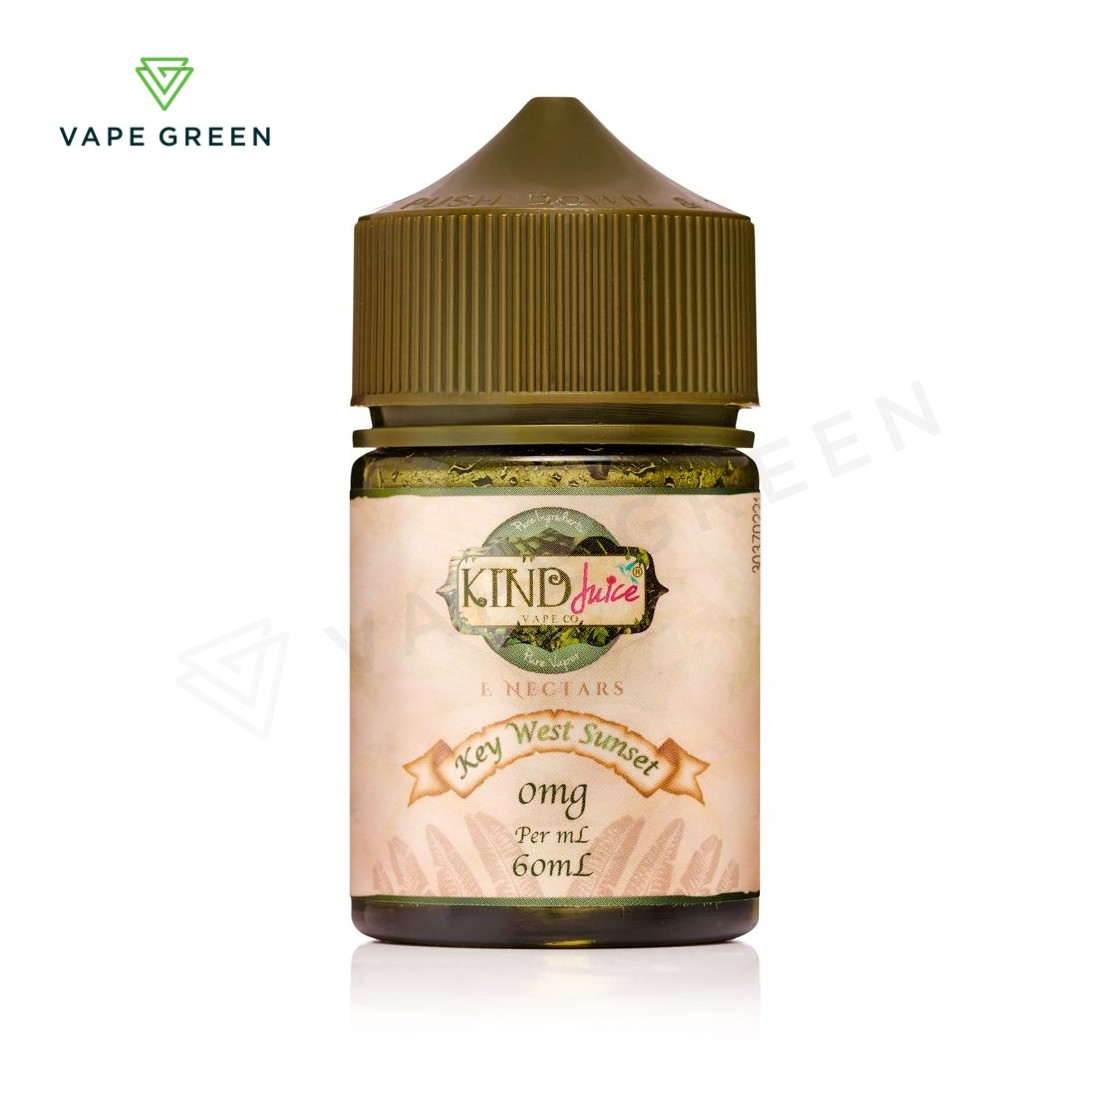 Key West Sunset E-Liquid by Kind Juice 50ml Shortfill